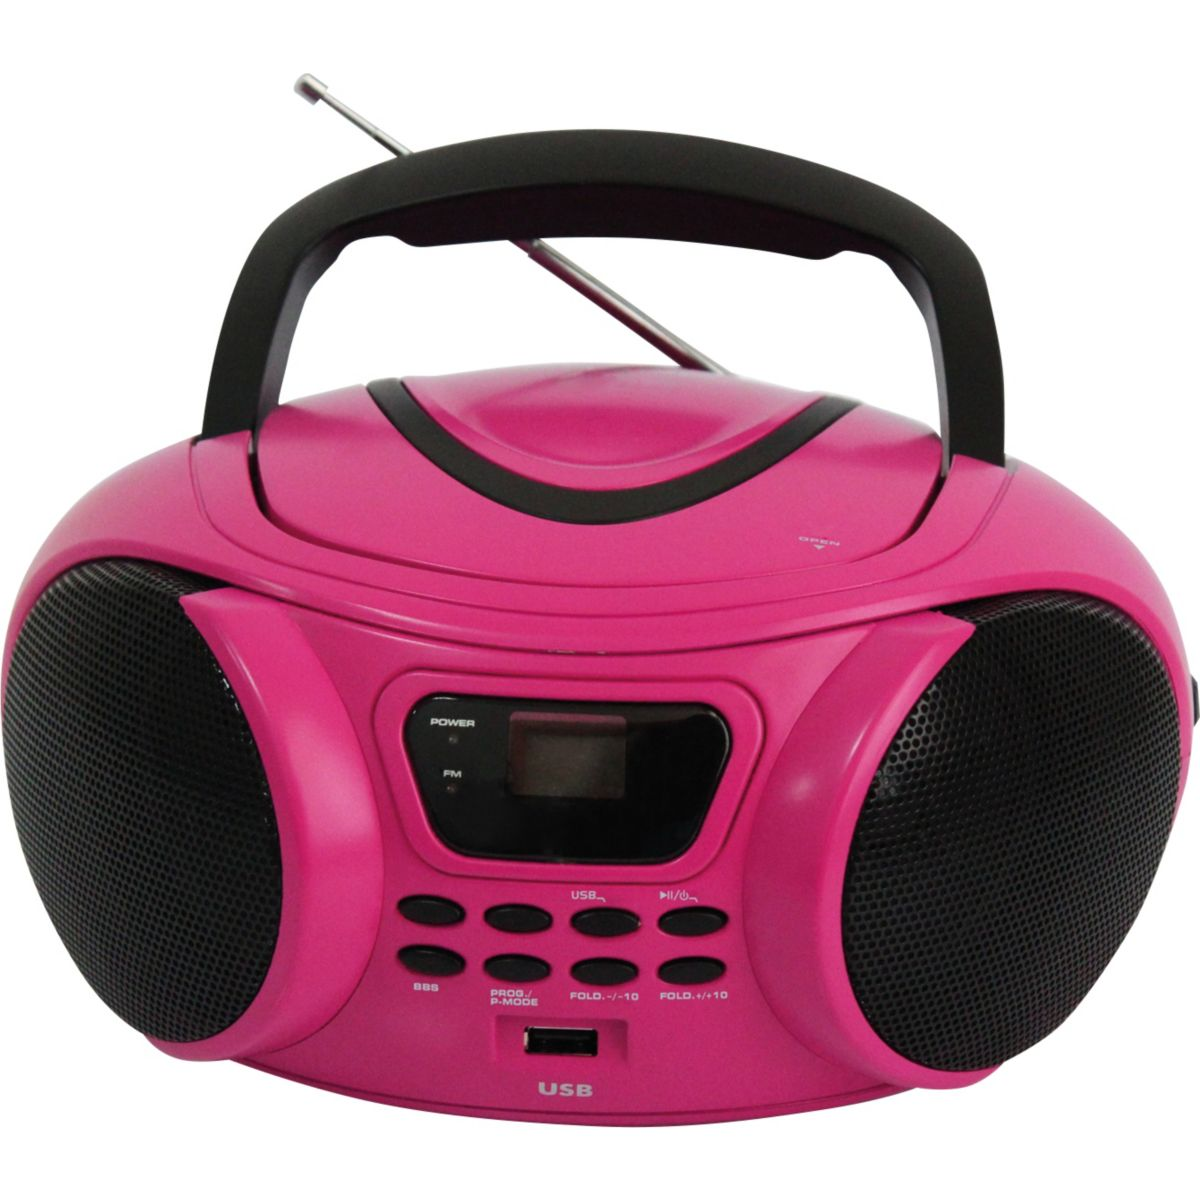 Radio CD ESSENTIELB Rumba USB MP3 Rose